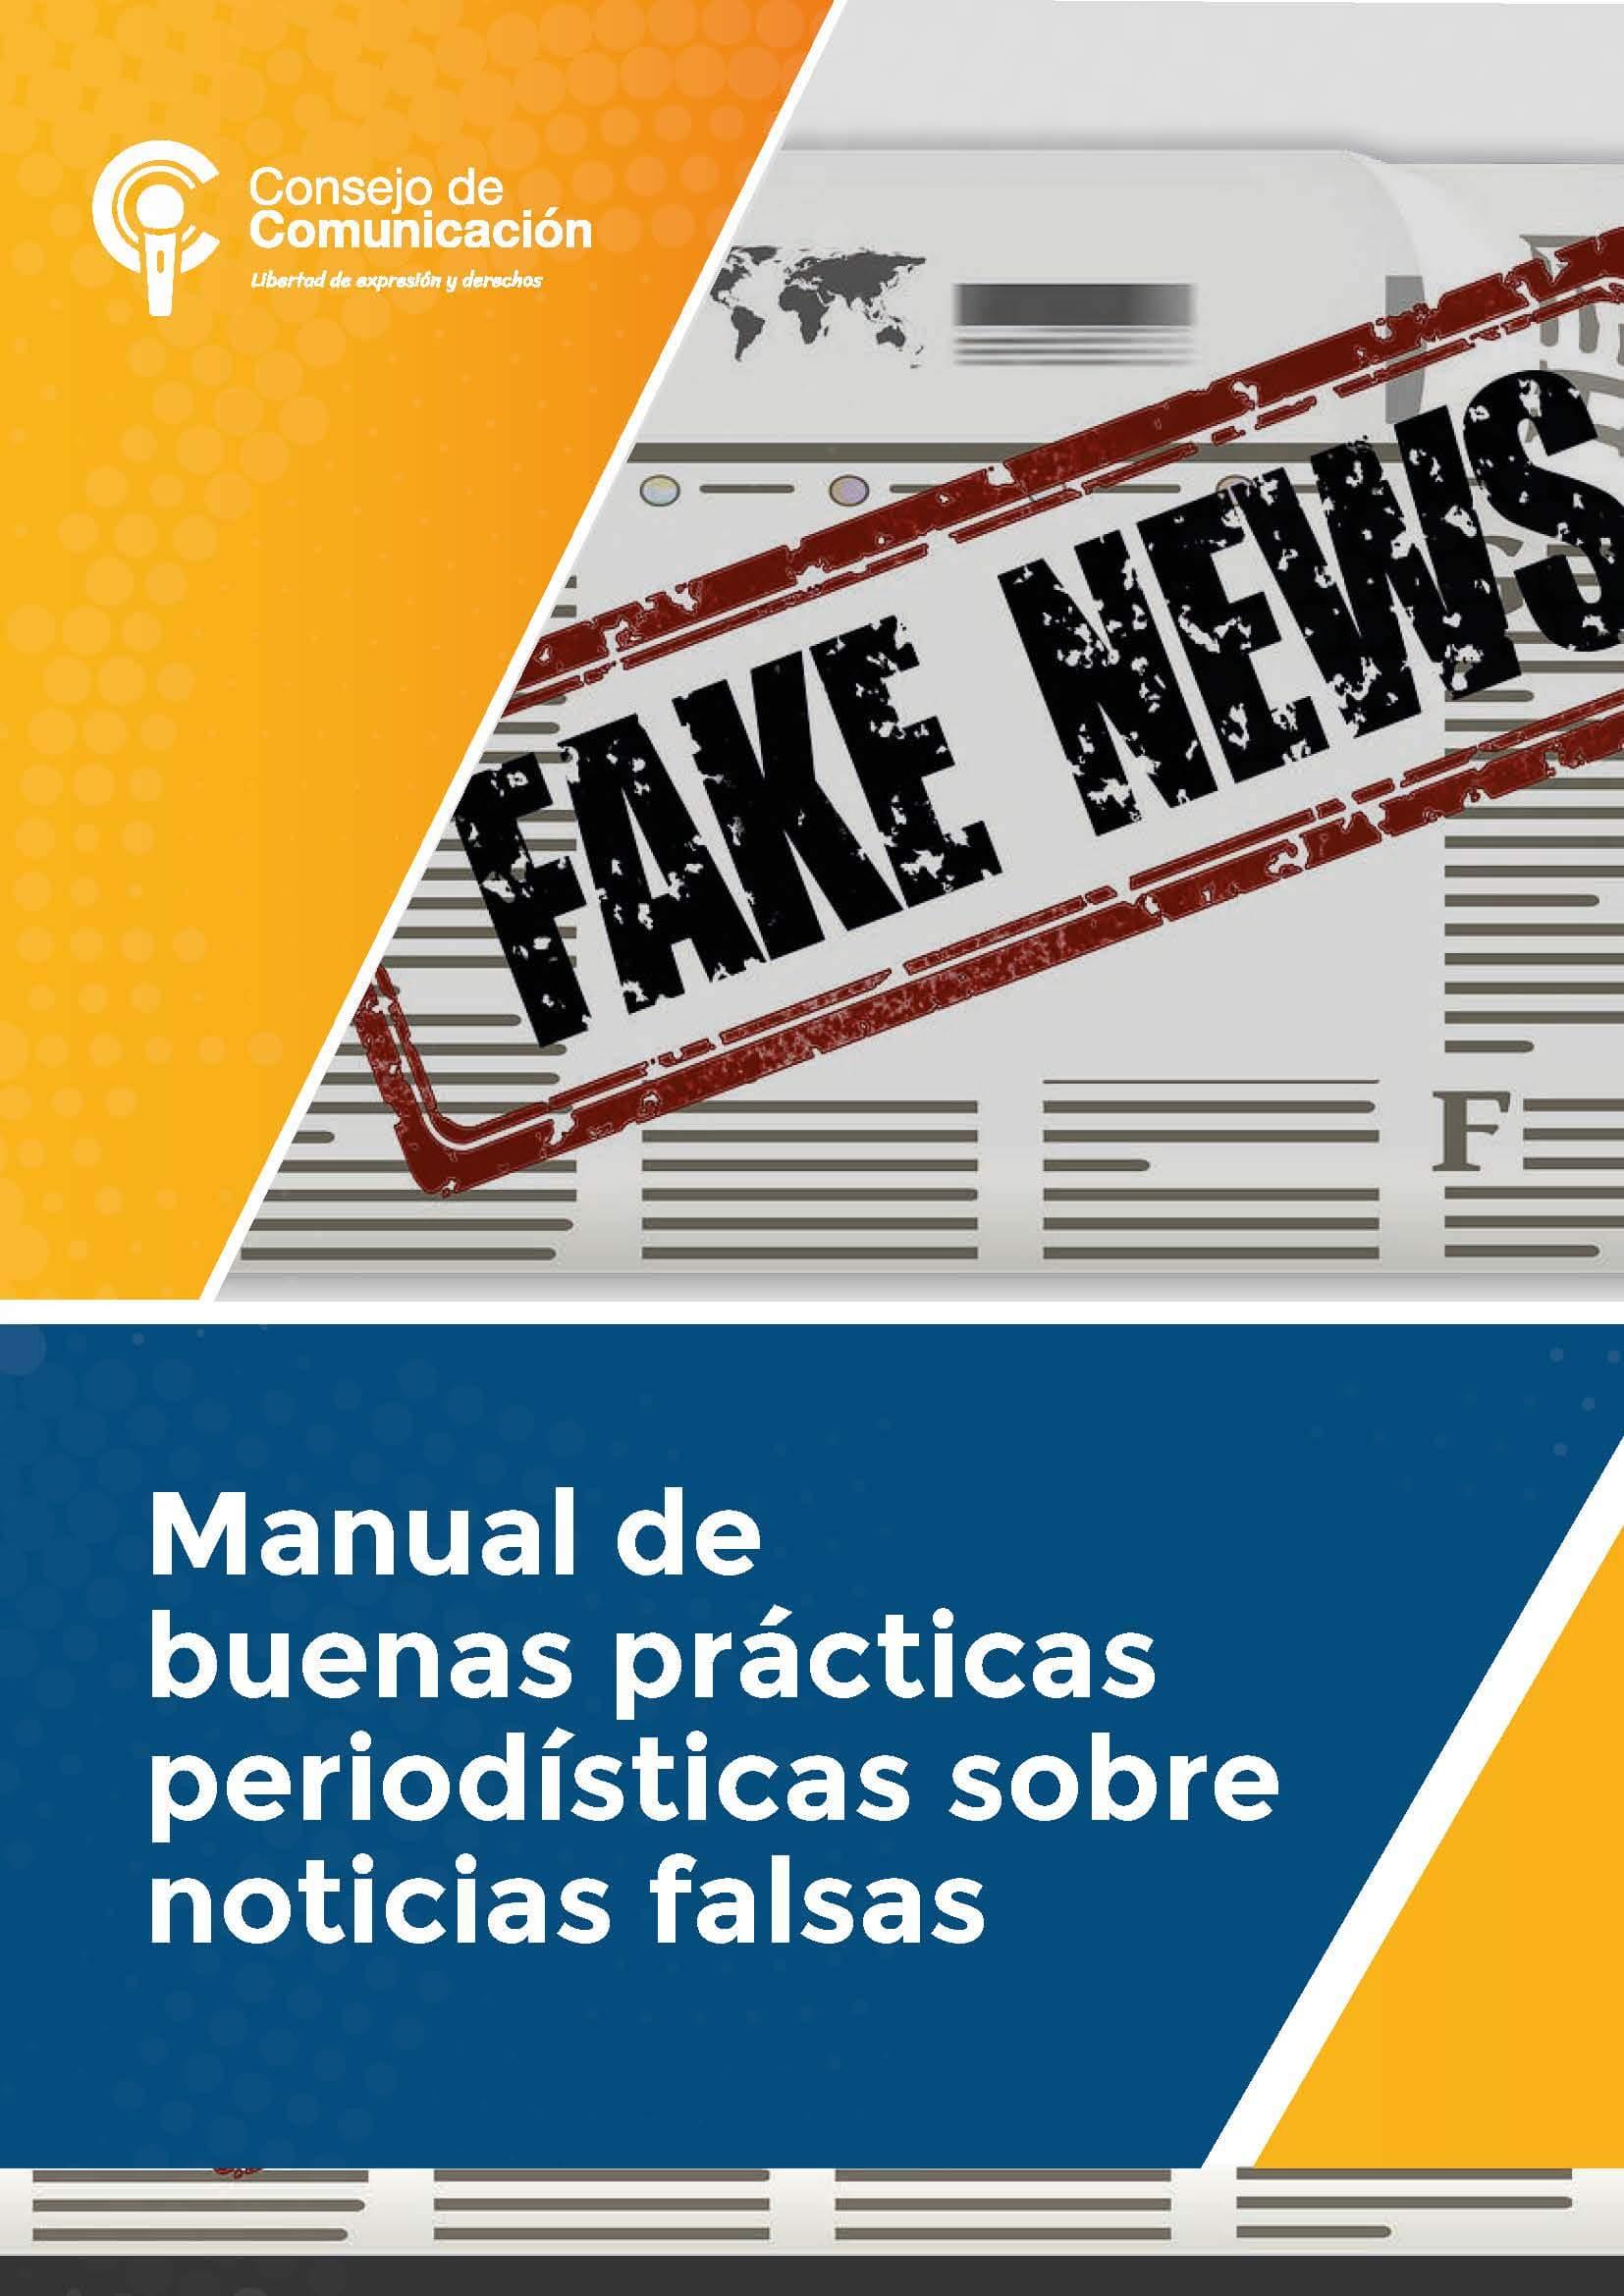 Manual de buenas prácticas periodísticas sobre noticias falsas